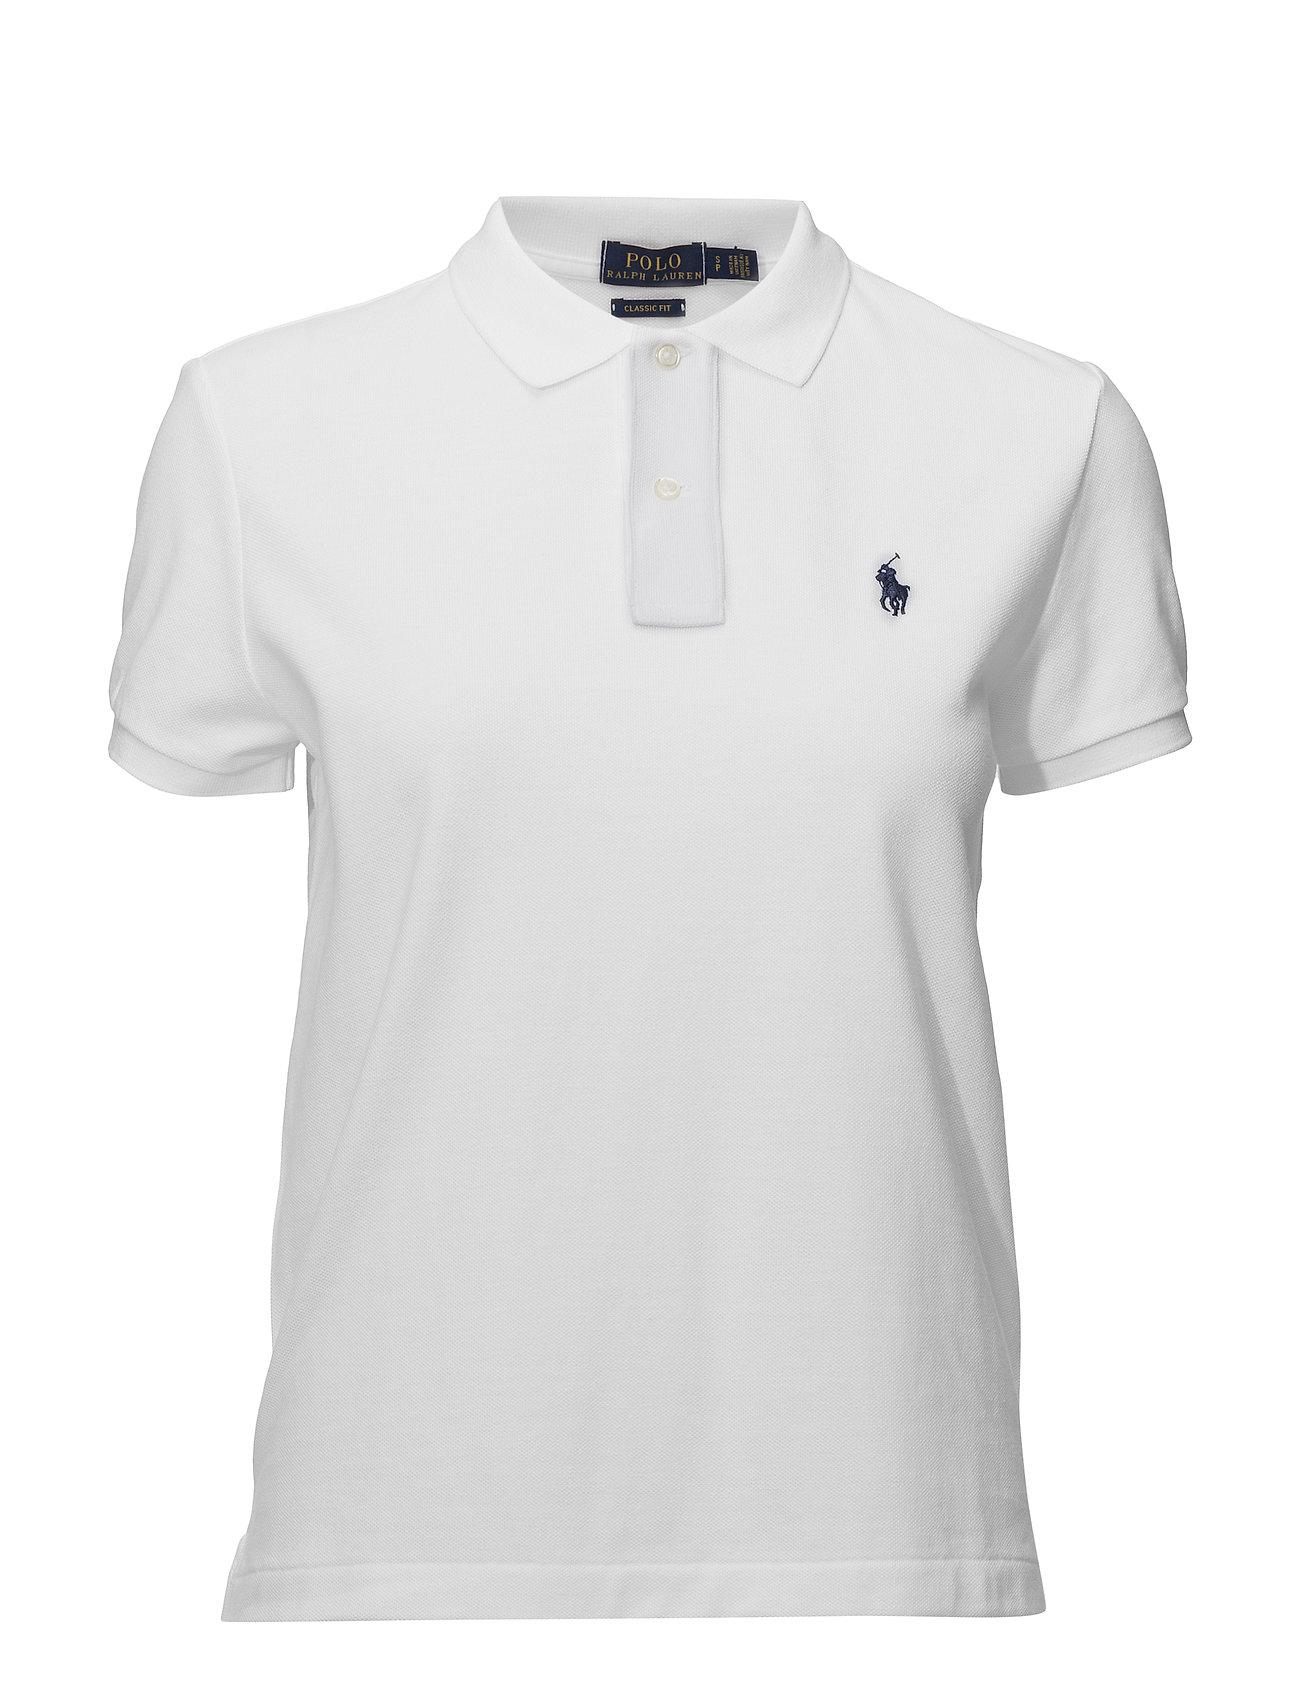 Polo Ralph Lauren Classic Fit Flag Polo Shirt